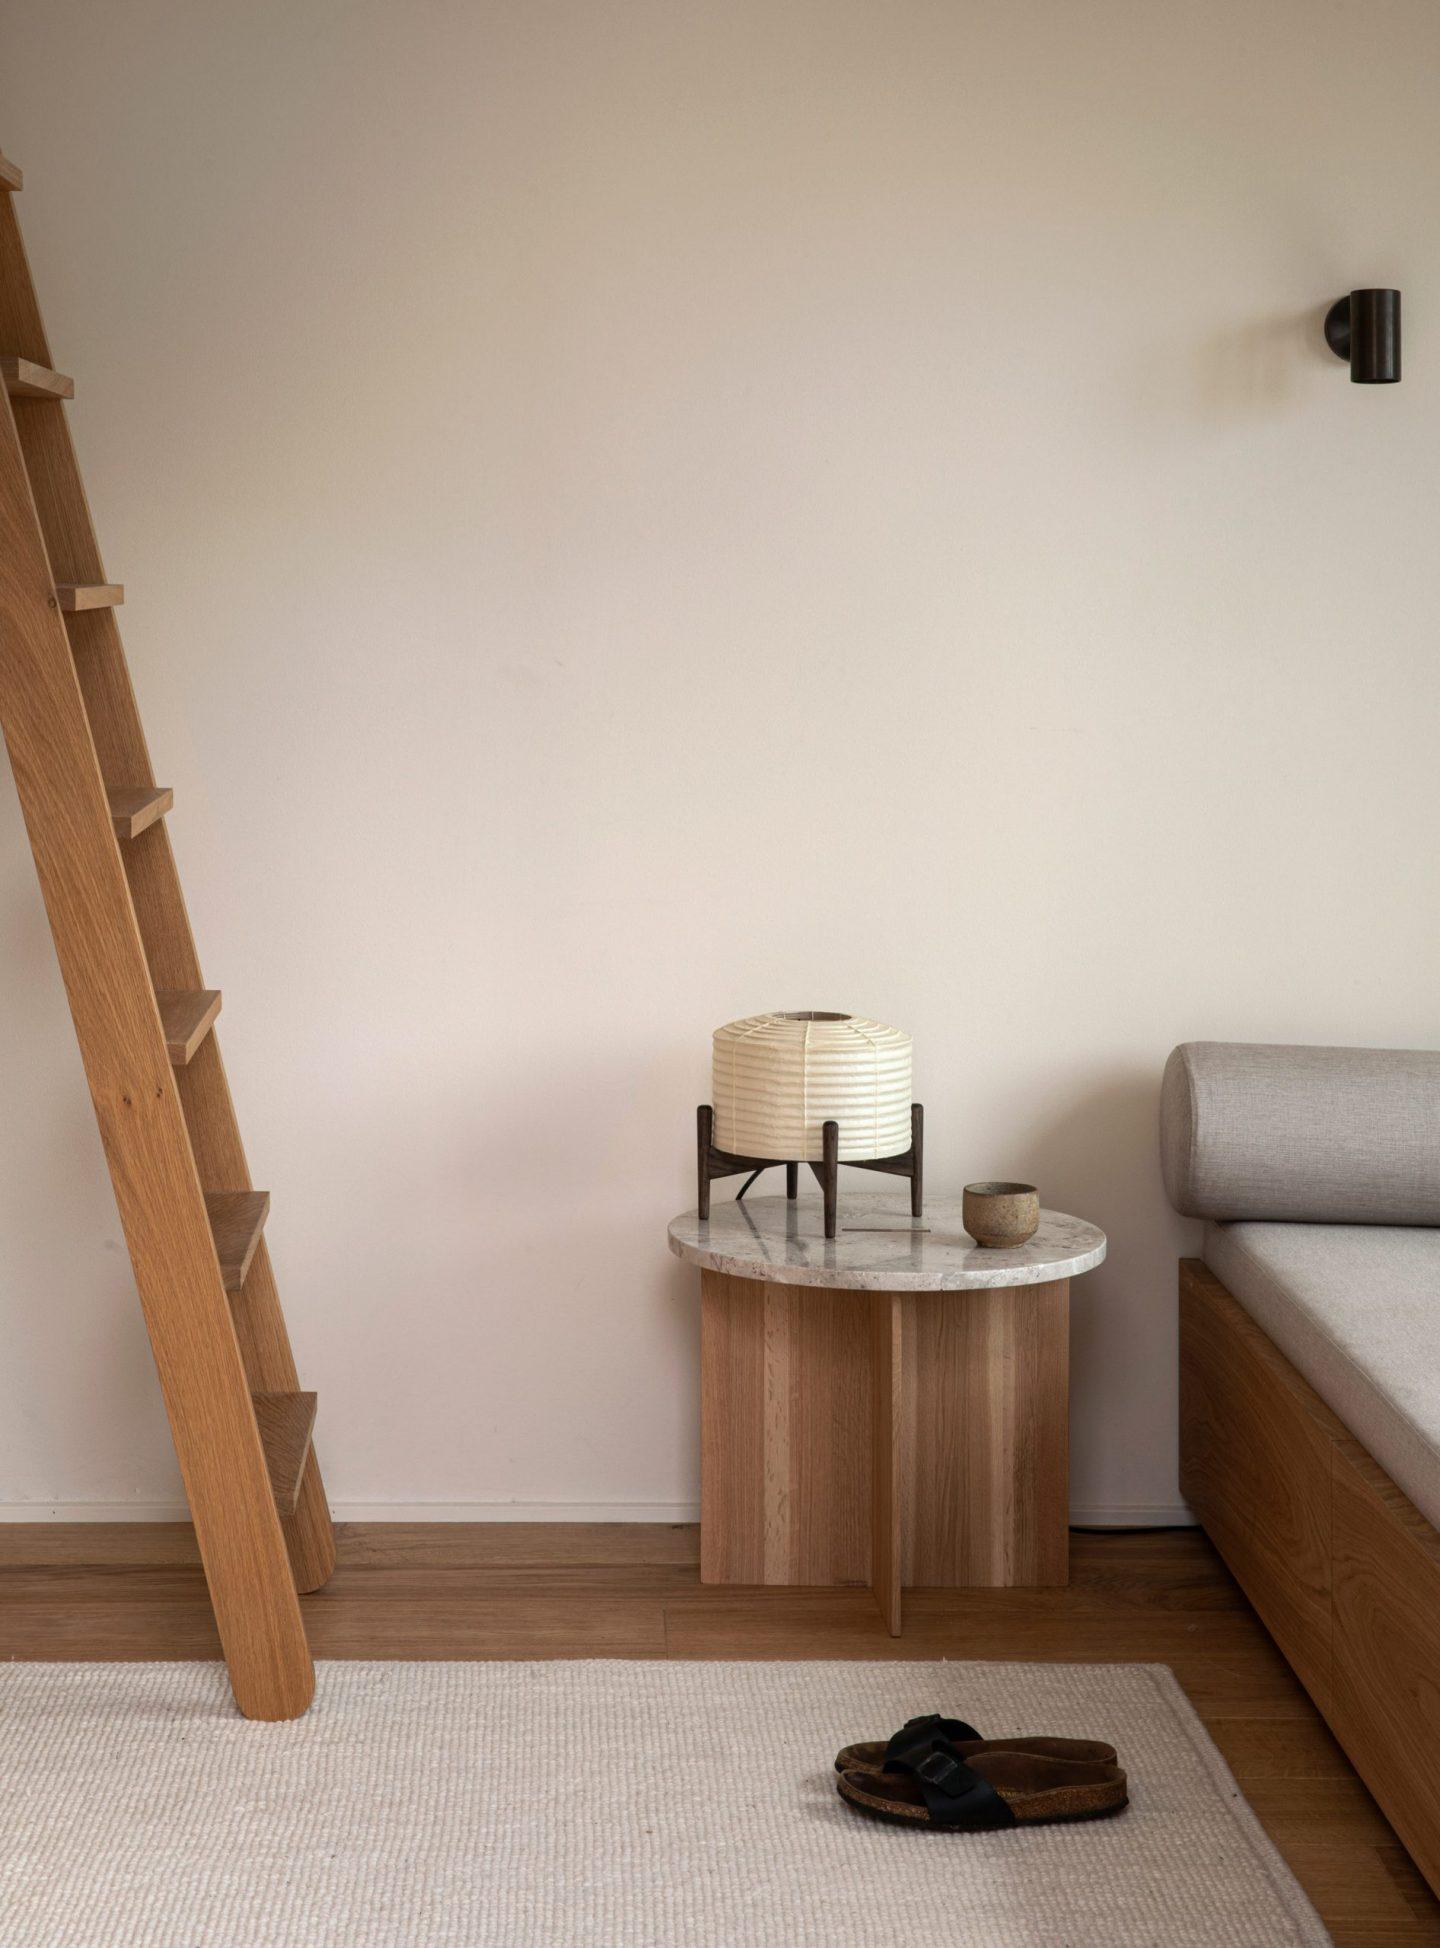 IGNANT-Architecture-Norm-Architects-Archipelago-House-019